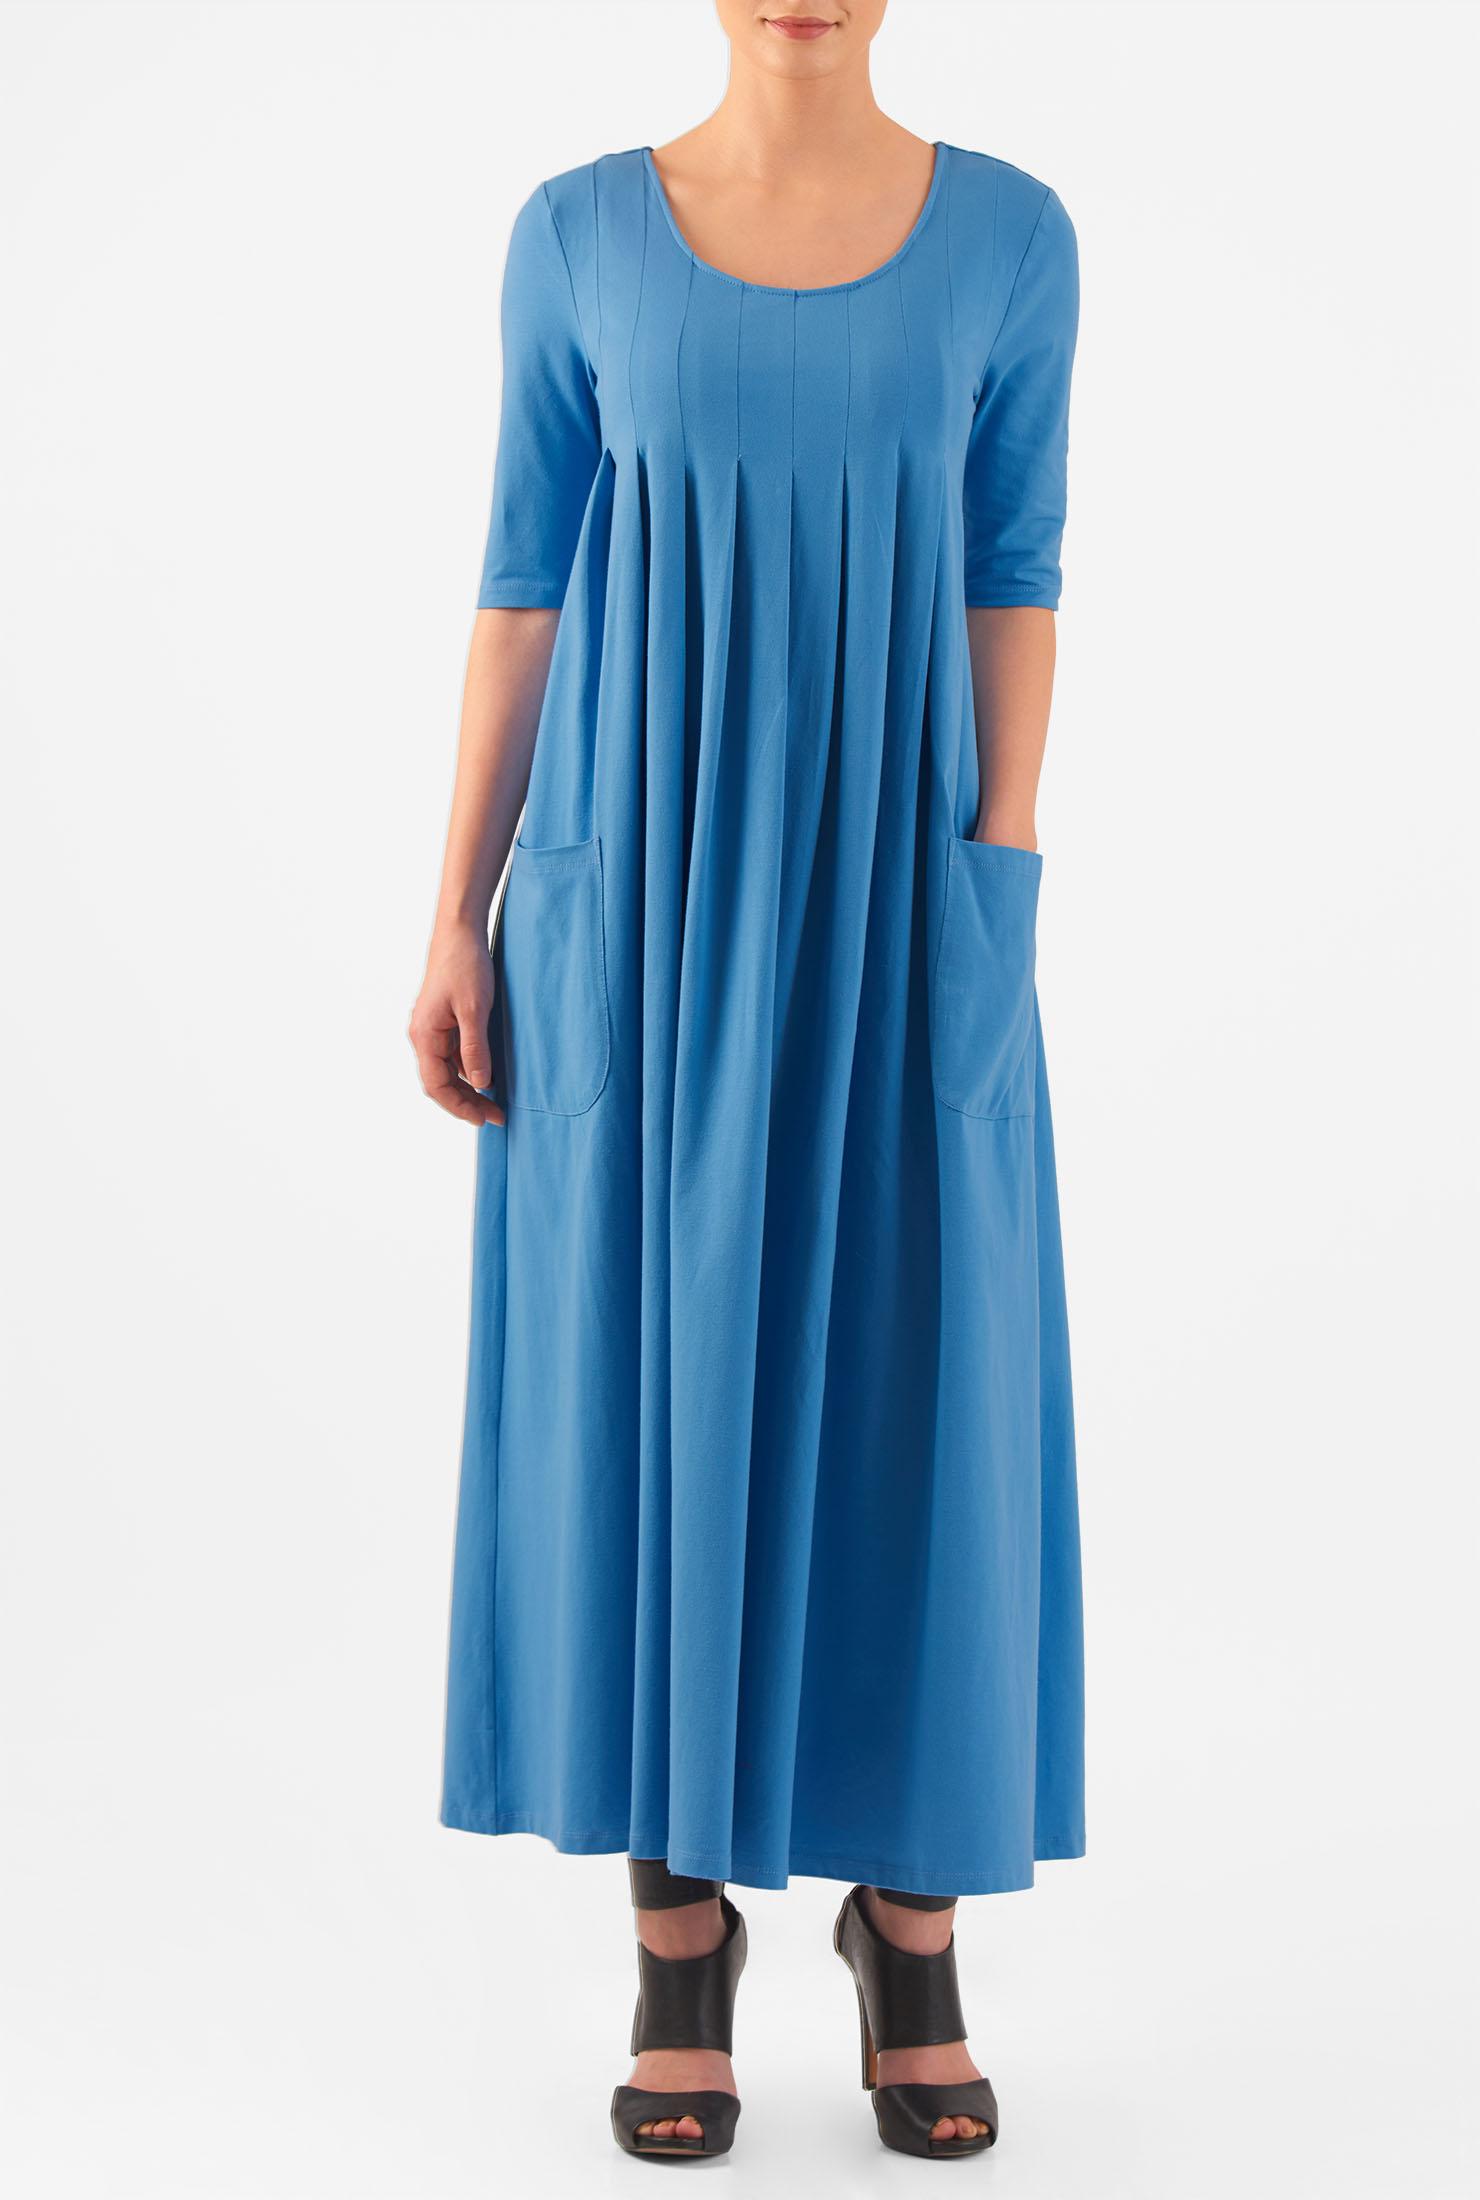 eShakti Women's Scoop neck pleated cotton knit dress CL0047101